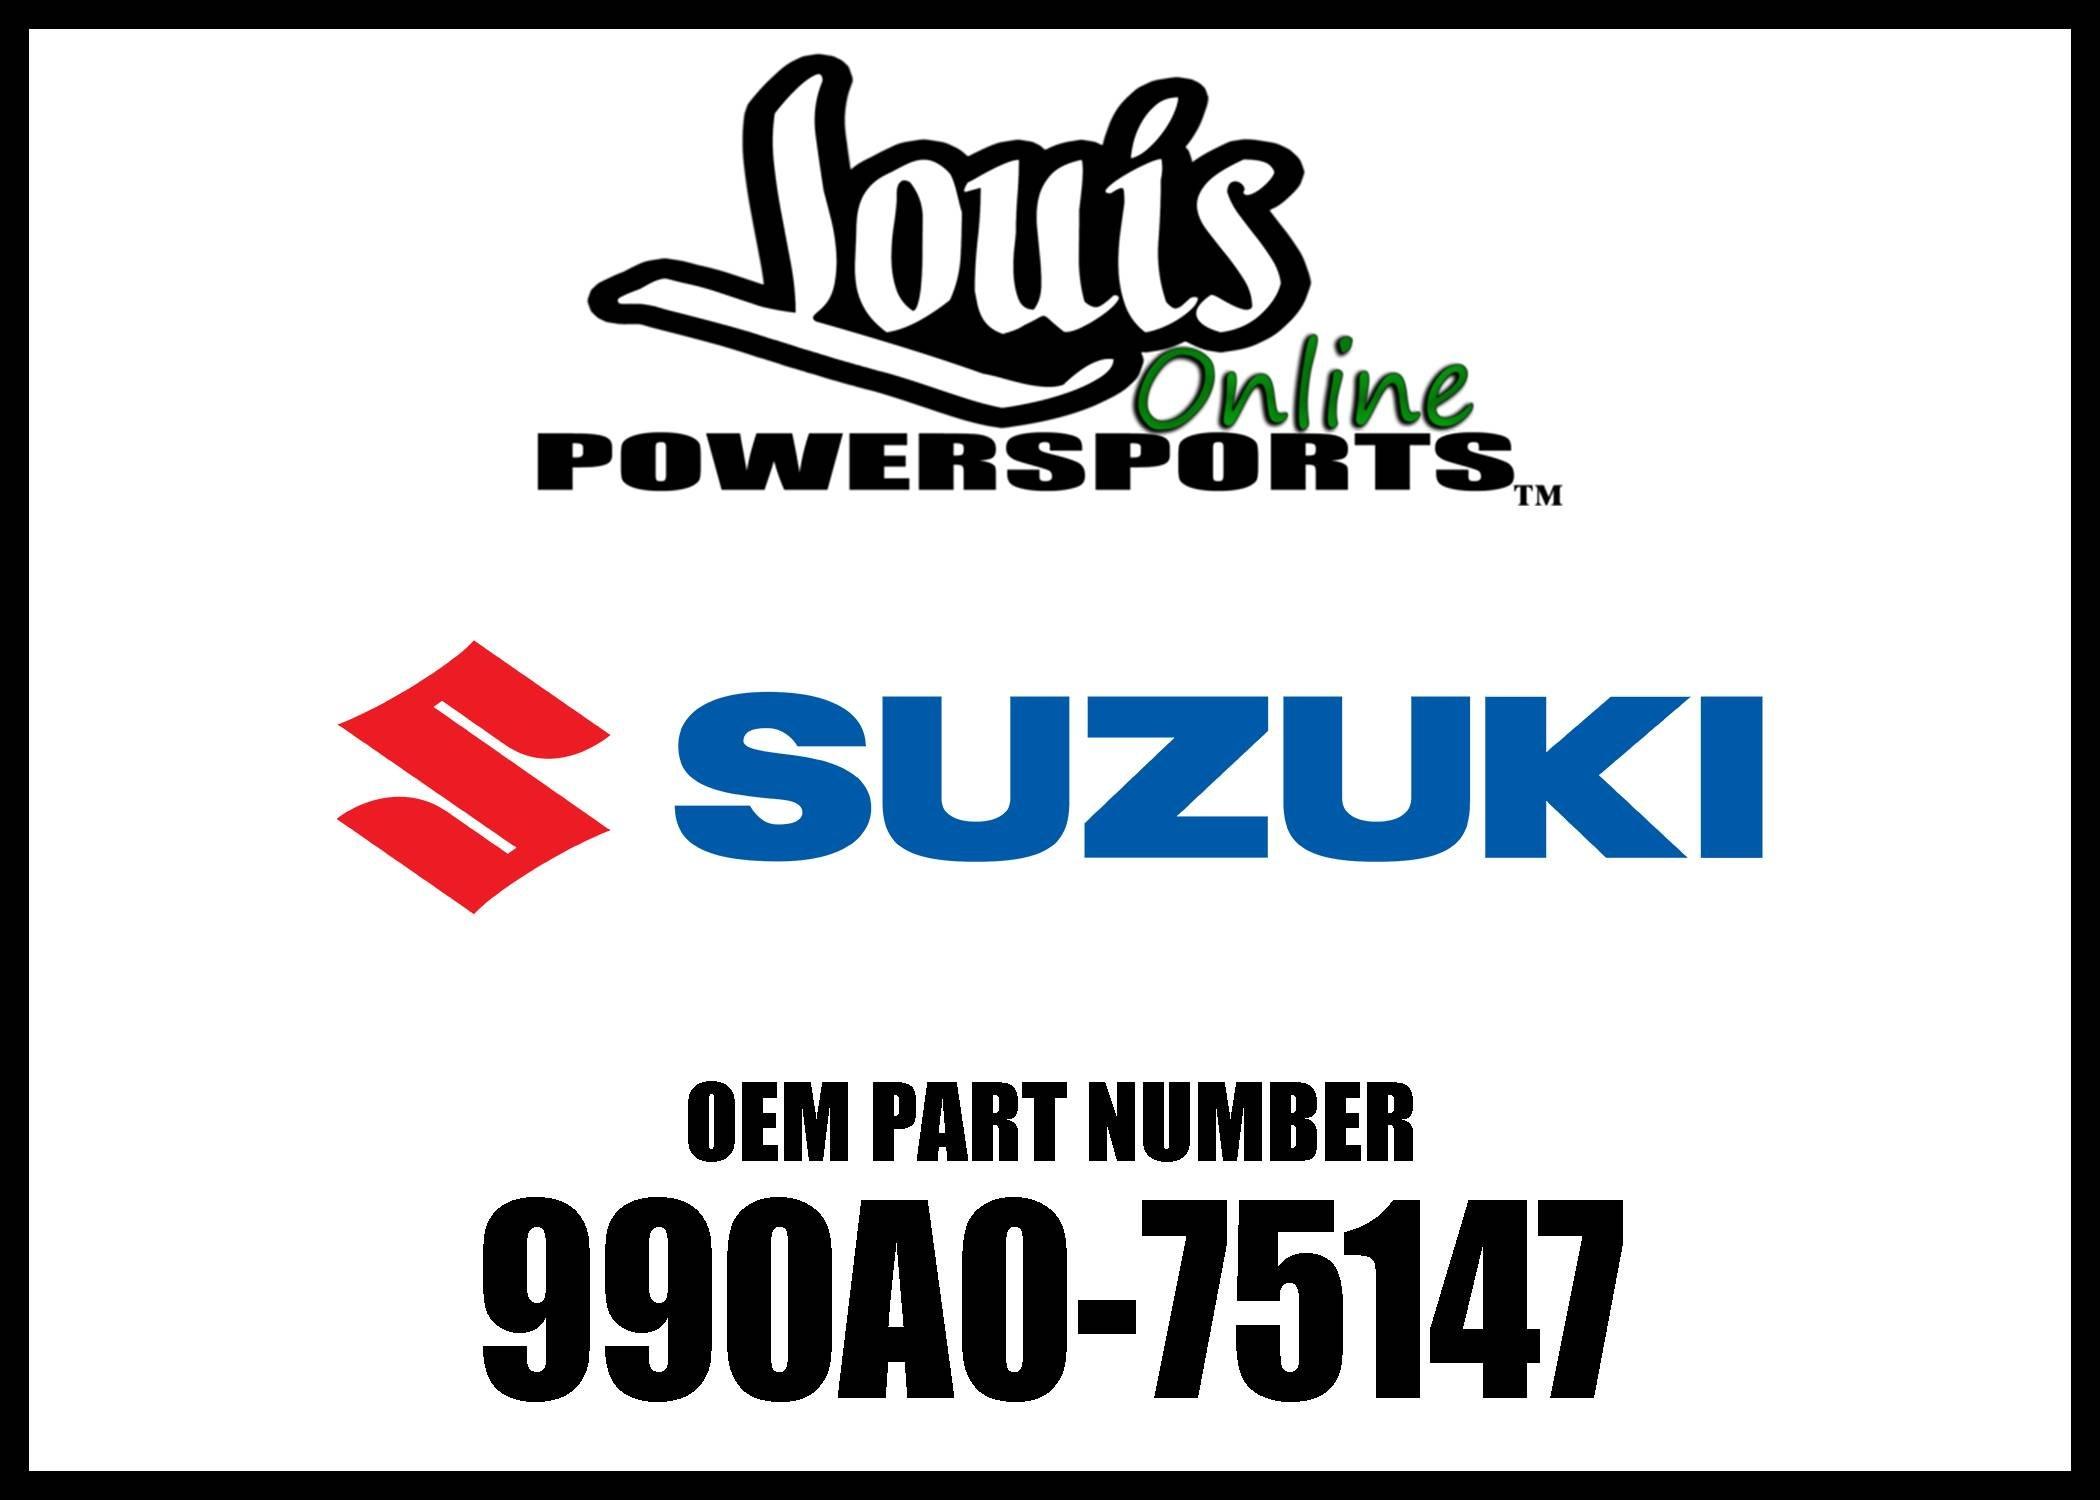 Suzuki 990A0-75147 Chrome Engine Guard